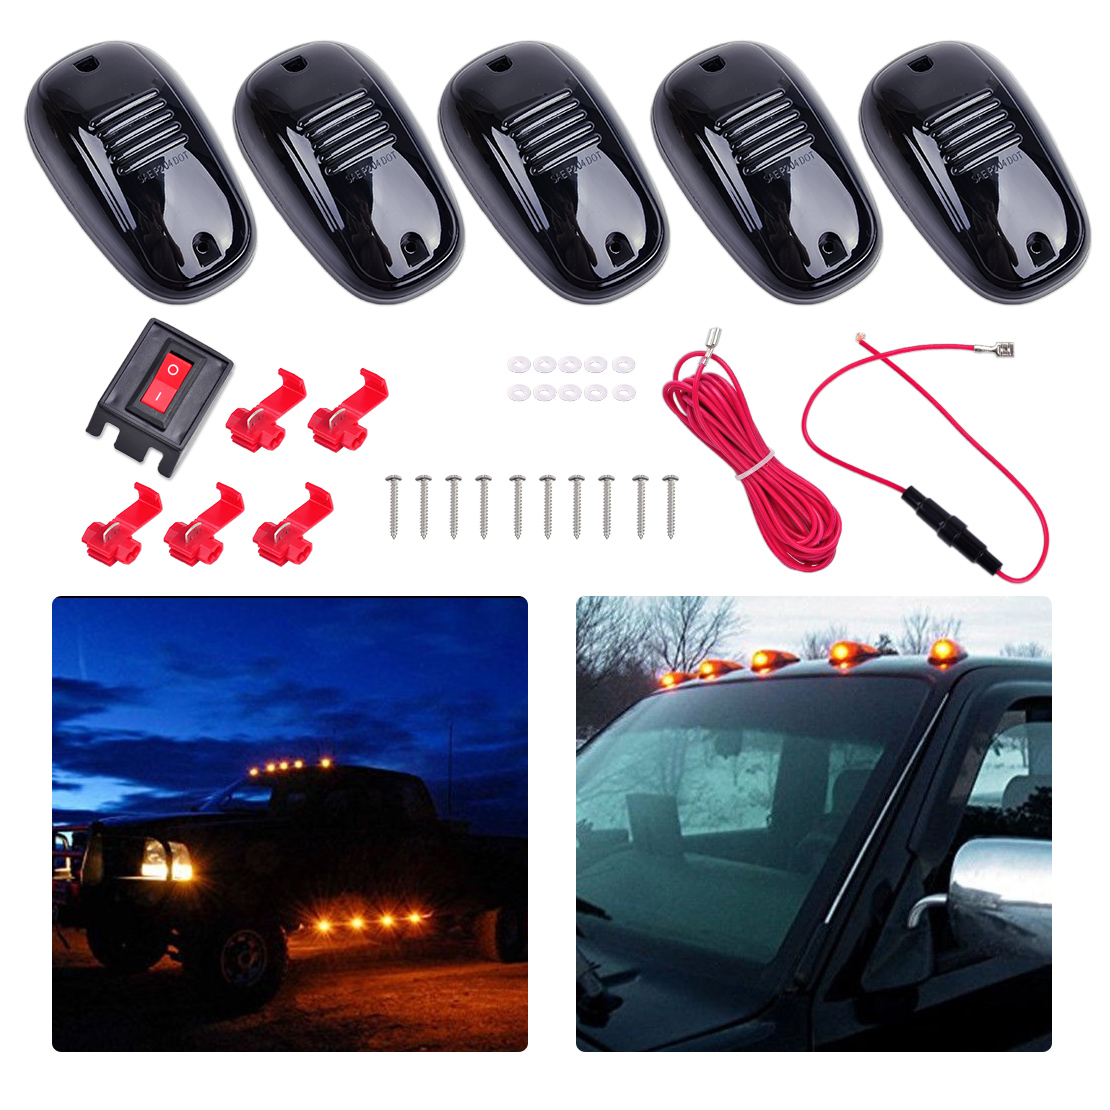 beler New 5Pcs 9 LED 12V Smoke Black Cover Amber Cab Marker Light Roof Top Lamp for Truck SUV Van Pickup Jeep Off-Road Crossover